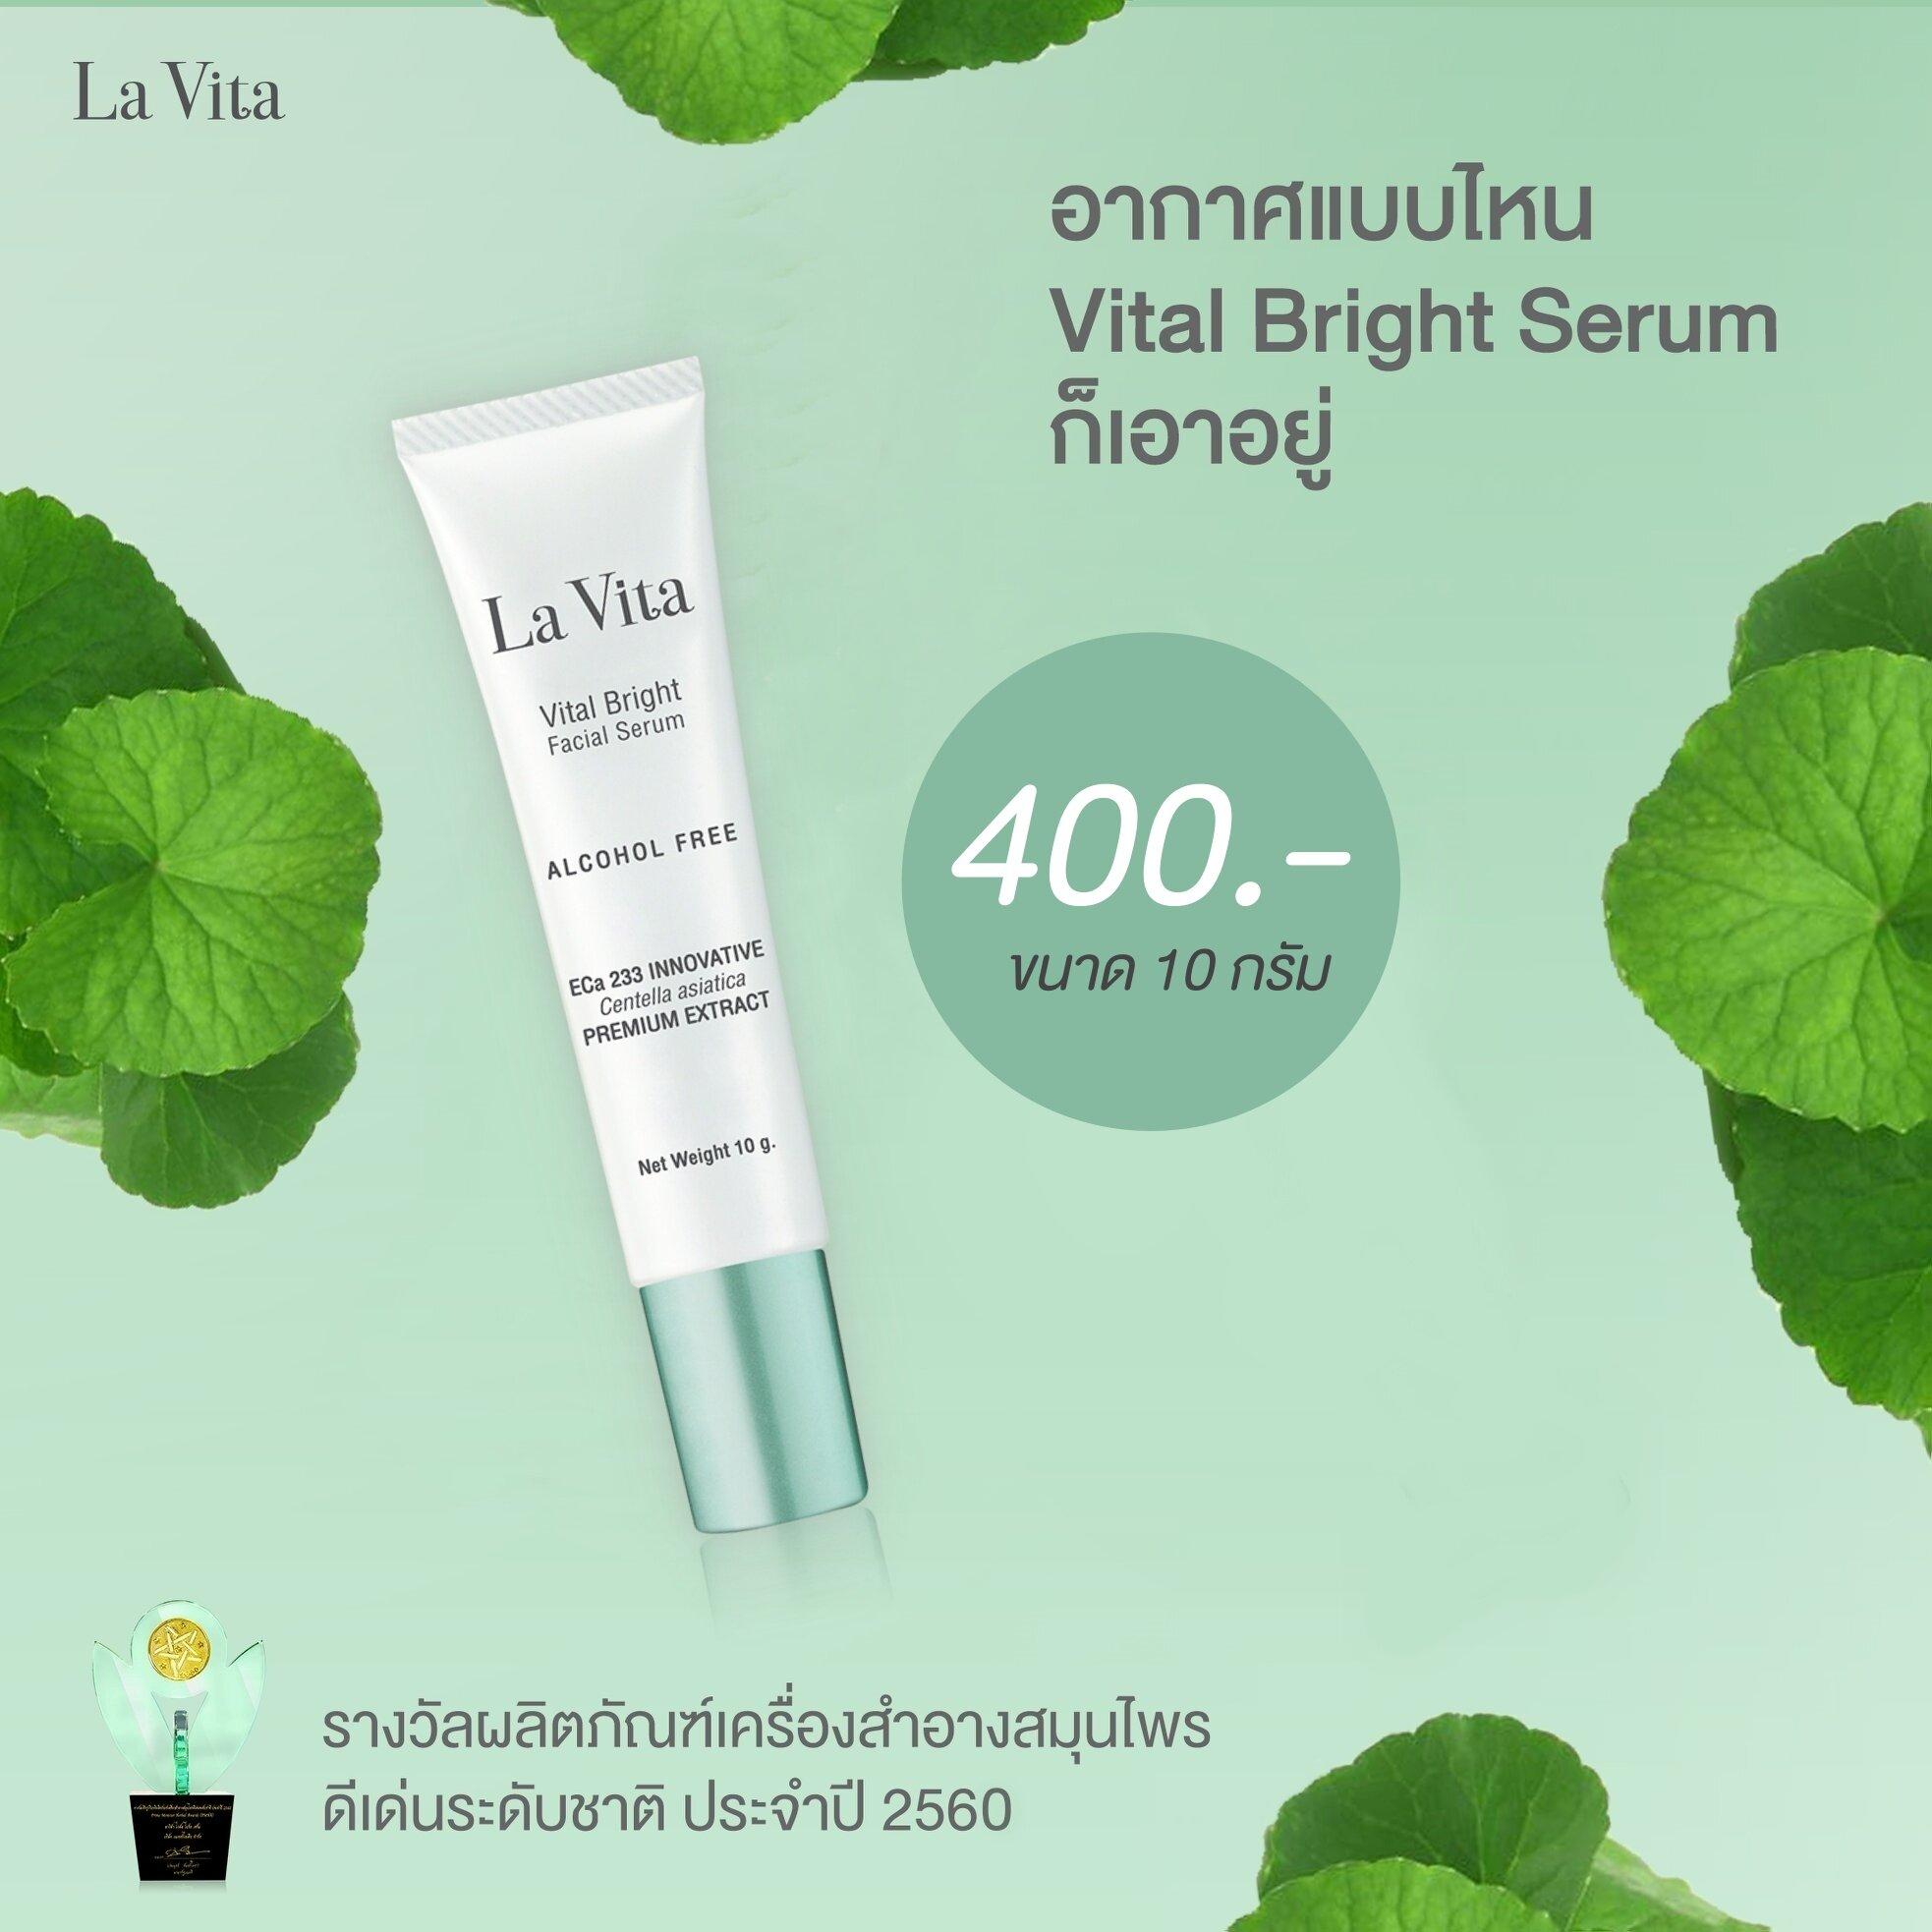 La Vita Vital Bright Facial Serum 10g